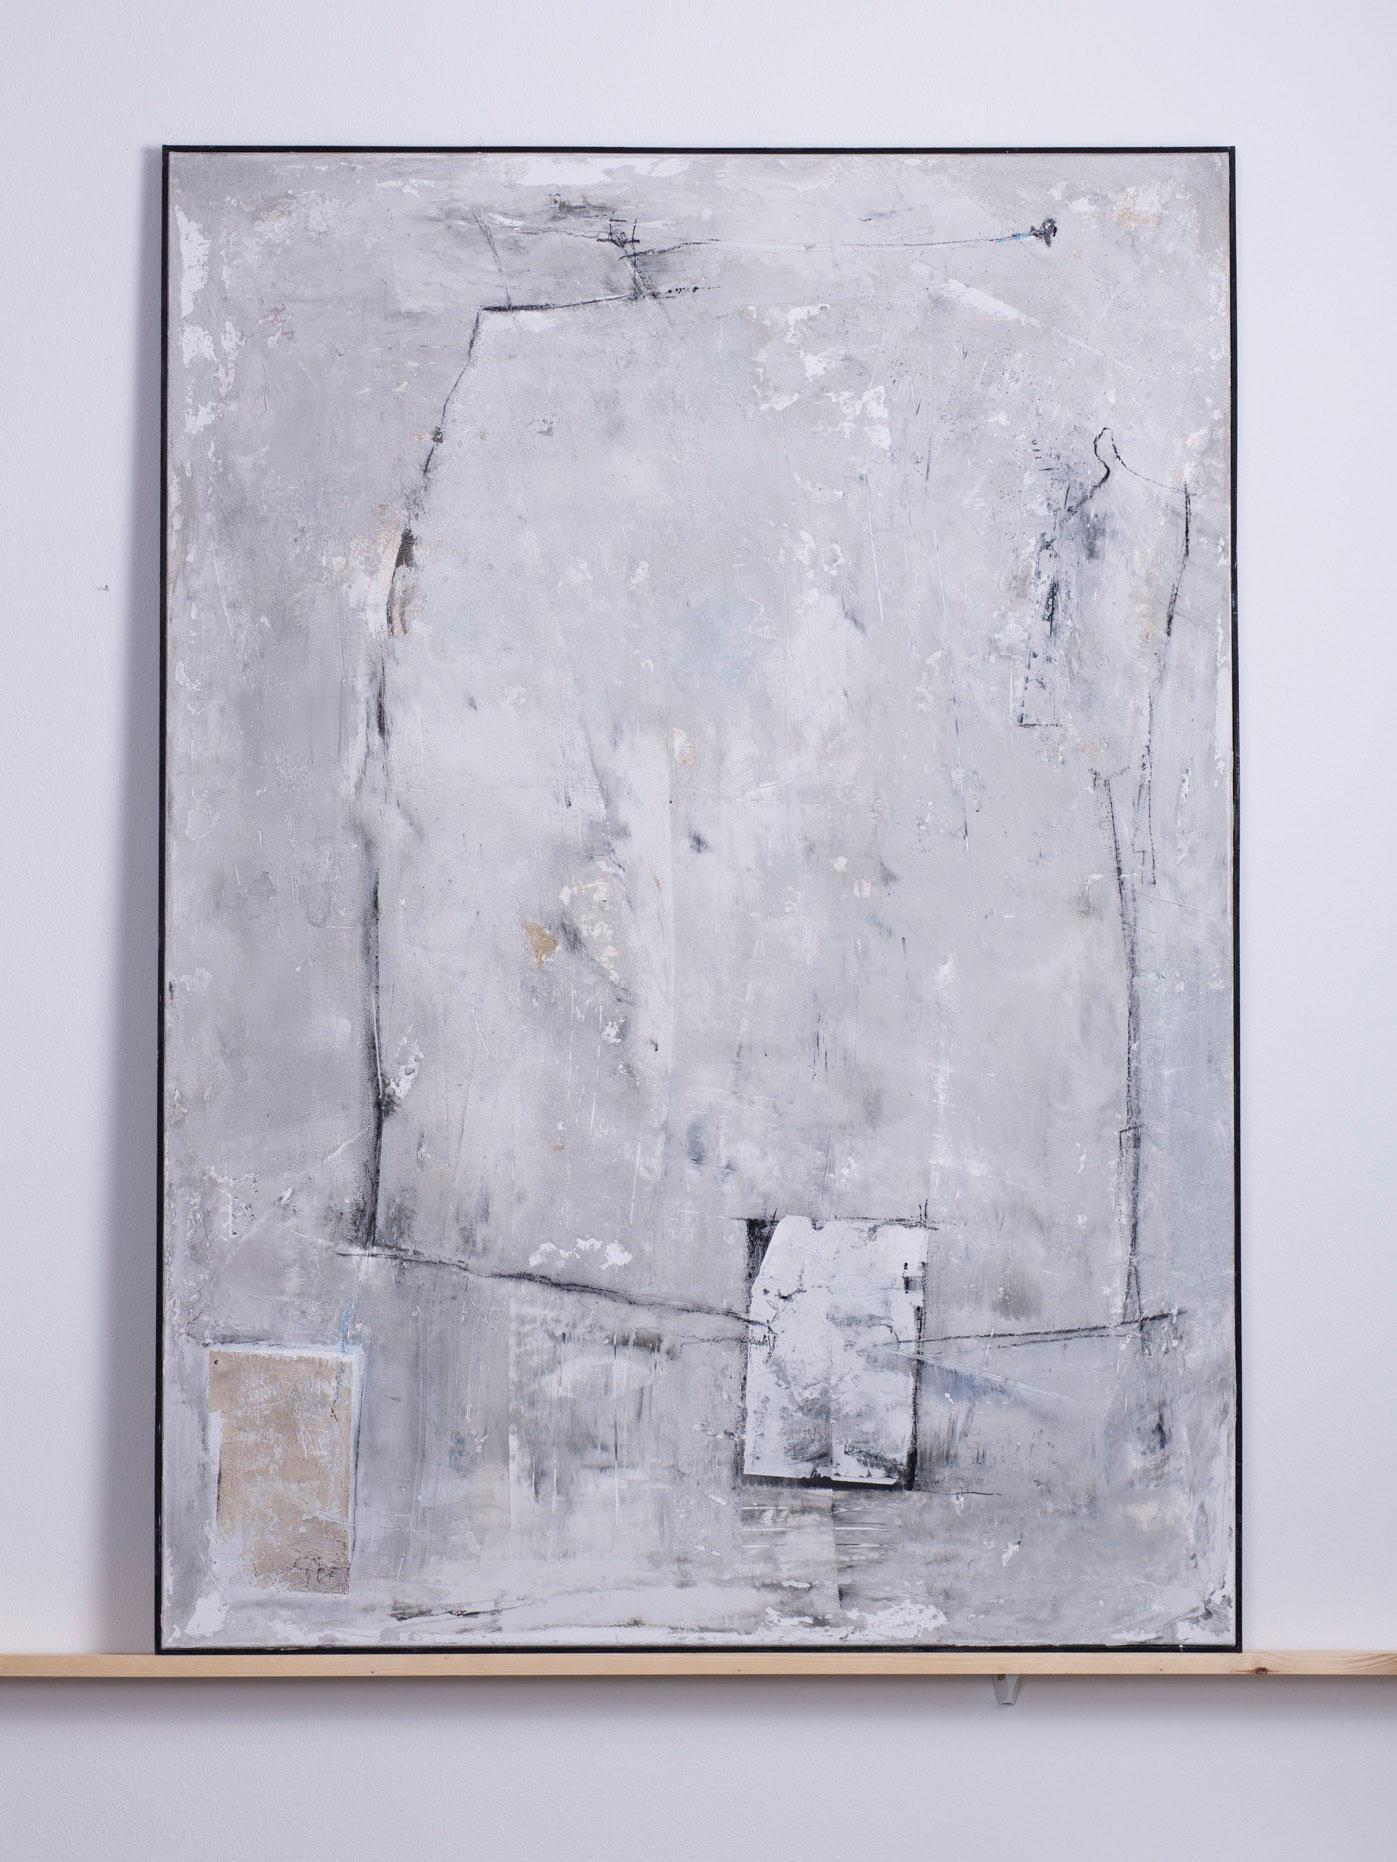 Ka-Rakum, 2011 - 100x140 cm, <br>Acryl, Spachtel und Kohle auf Leinwand